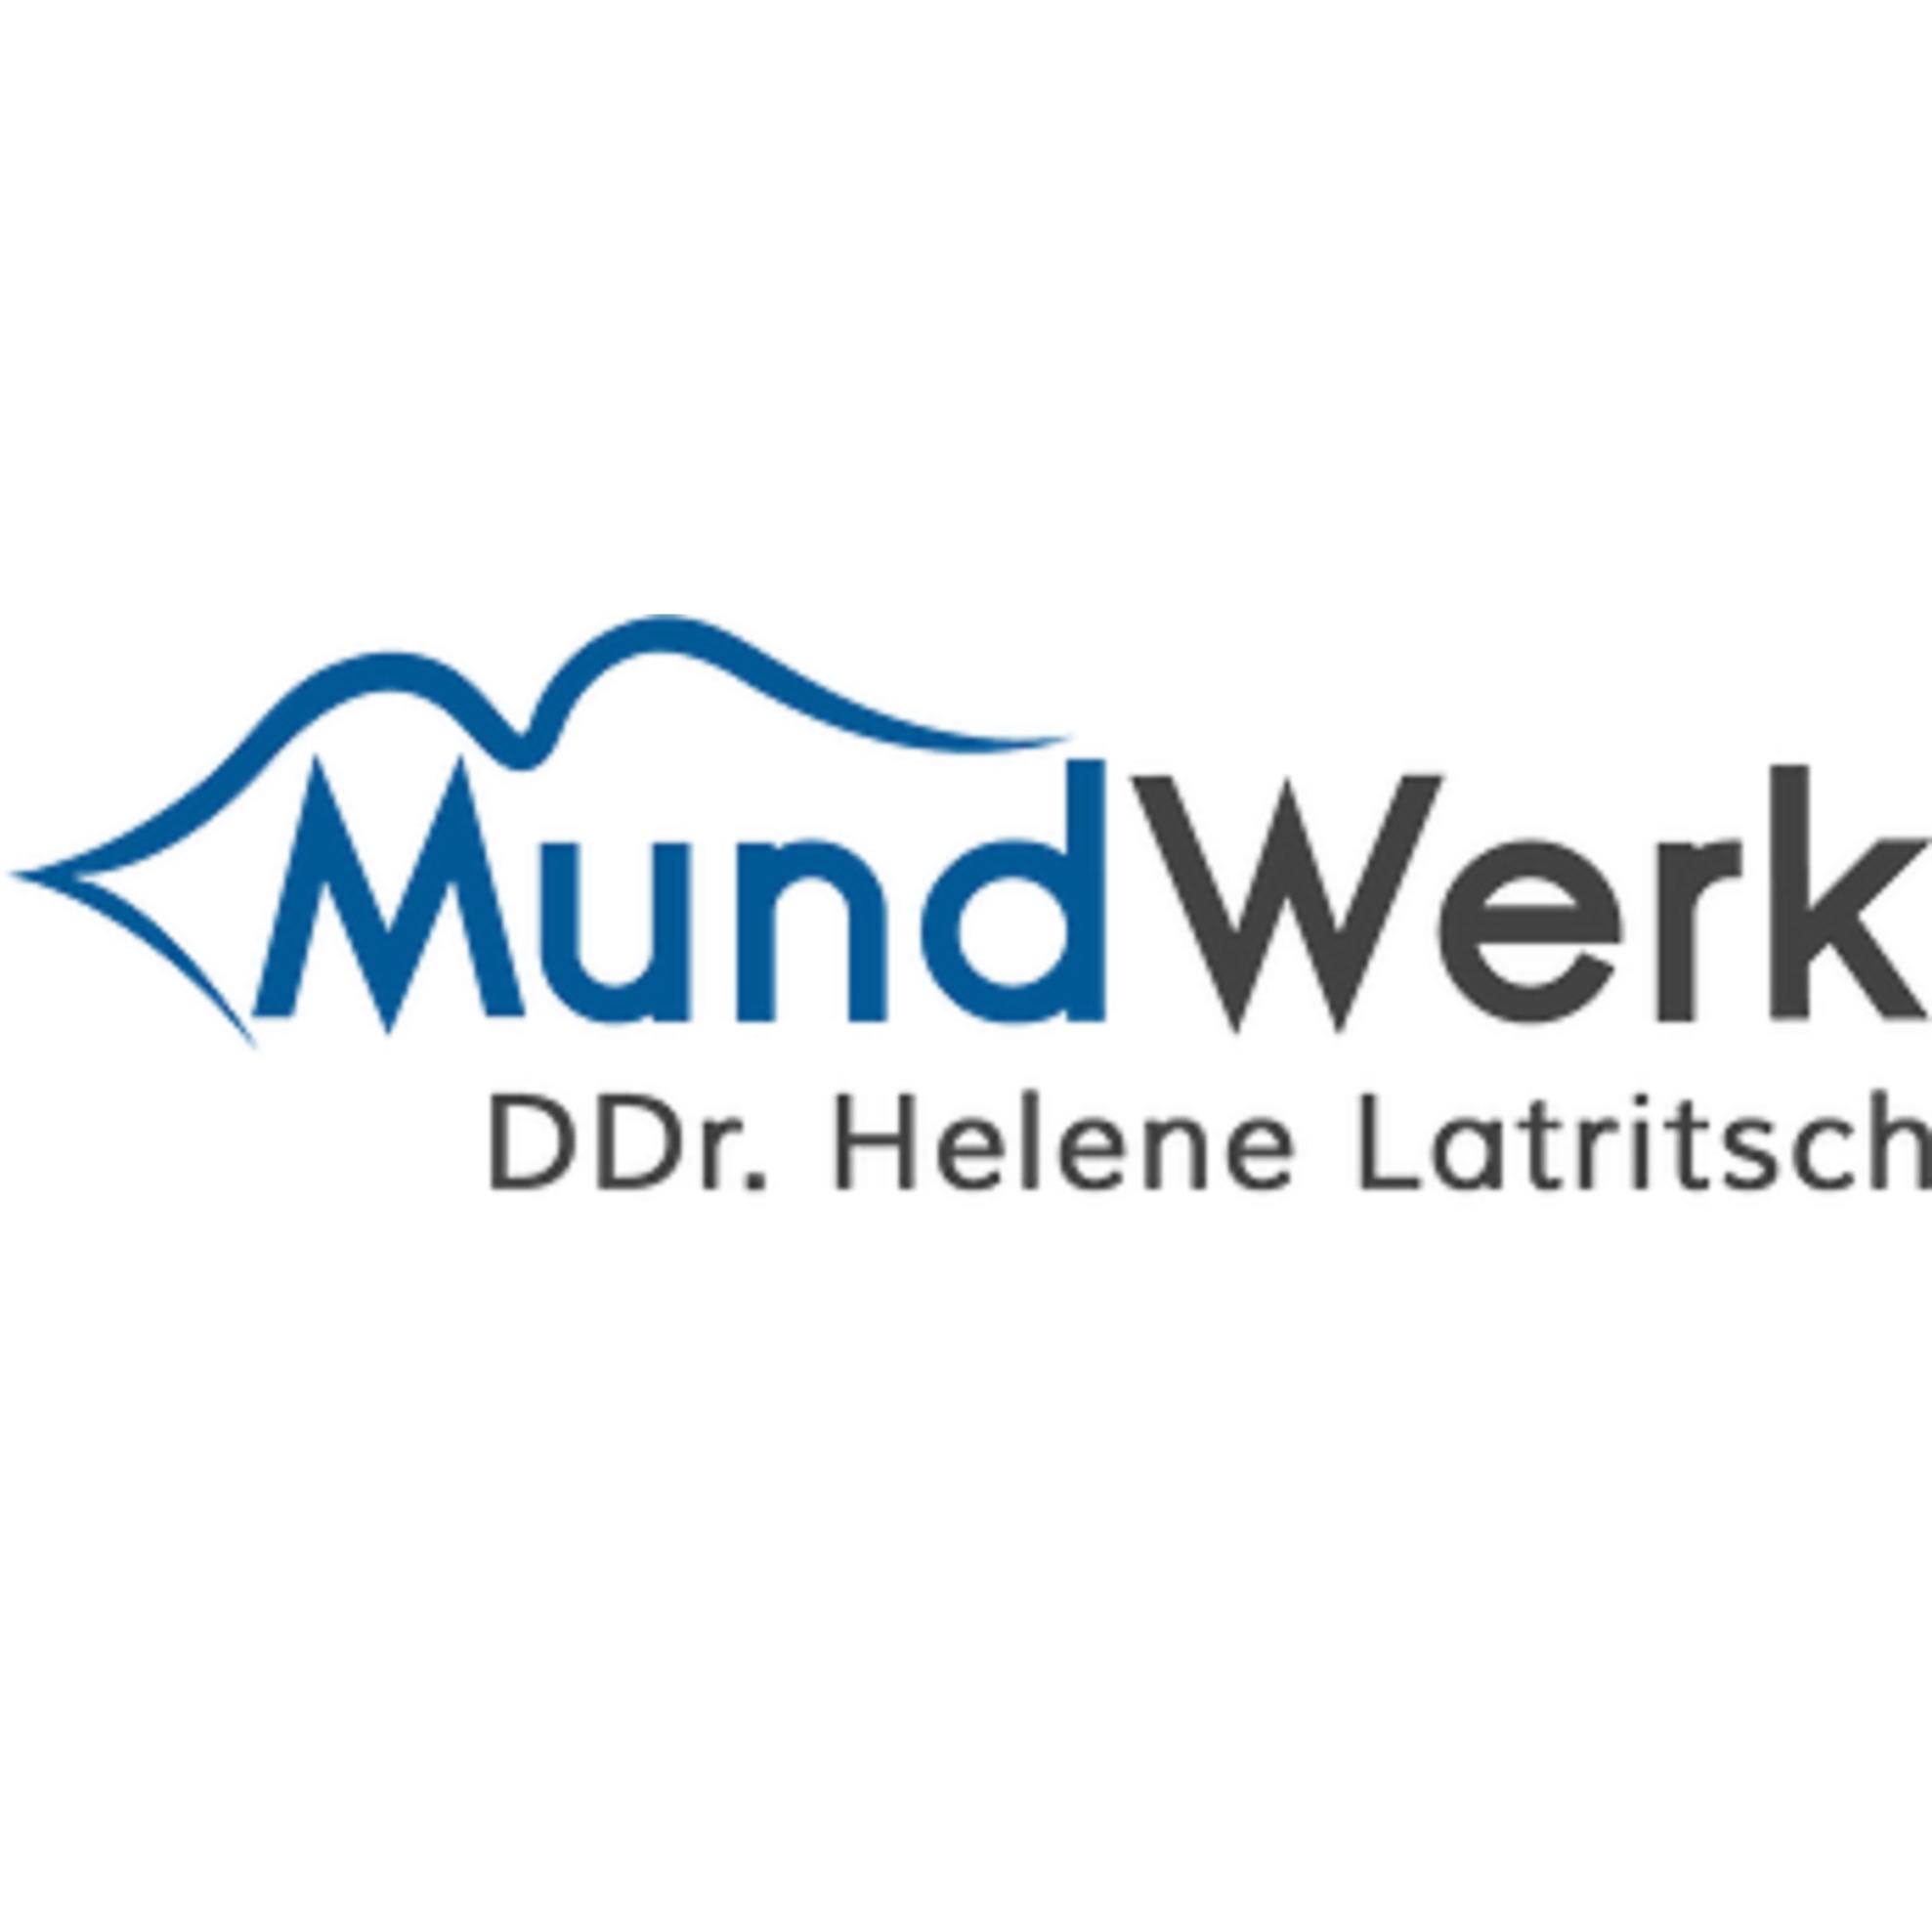 DDr. Helene Latritsch